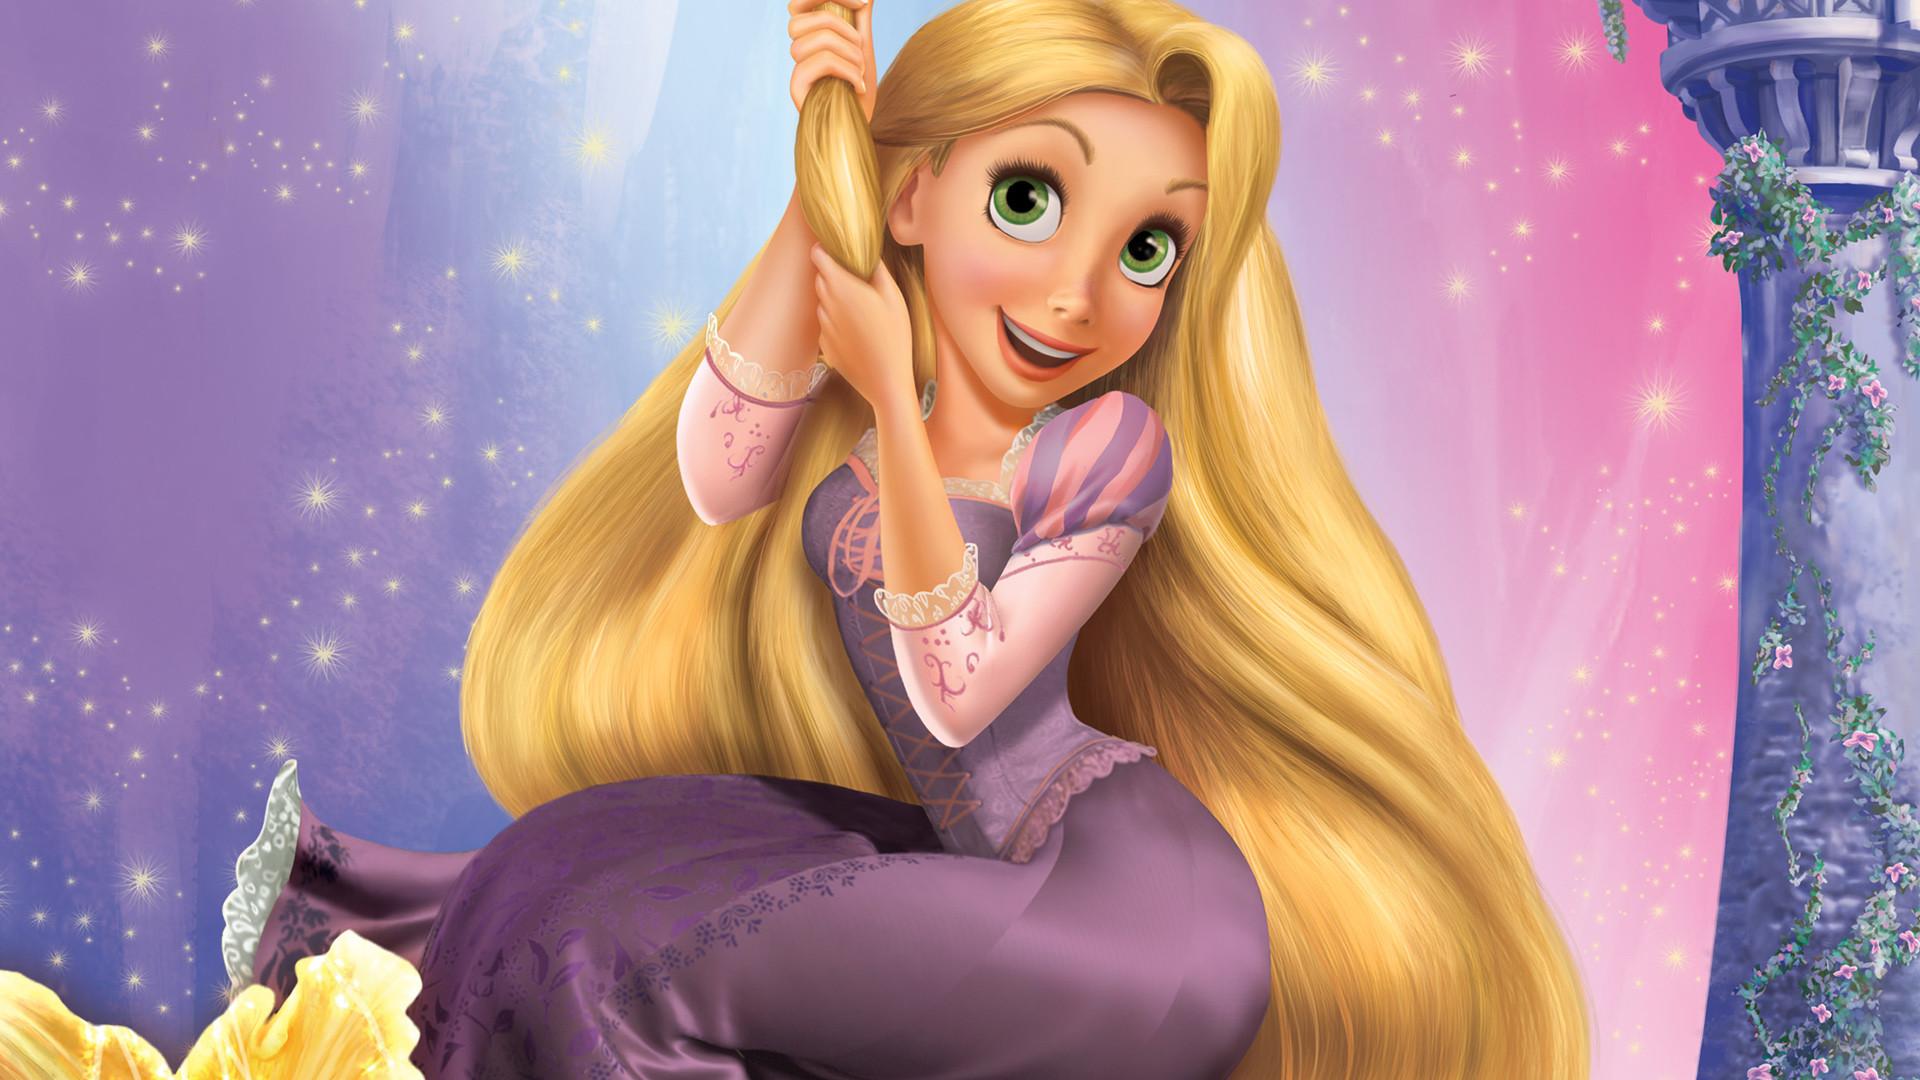 Rapunzel wallpaper hd 70 images - Rapunzel wallpaper ...